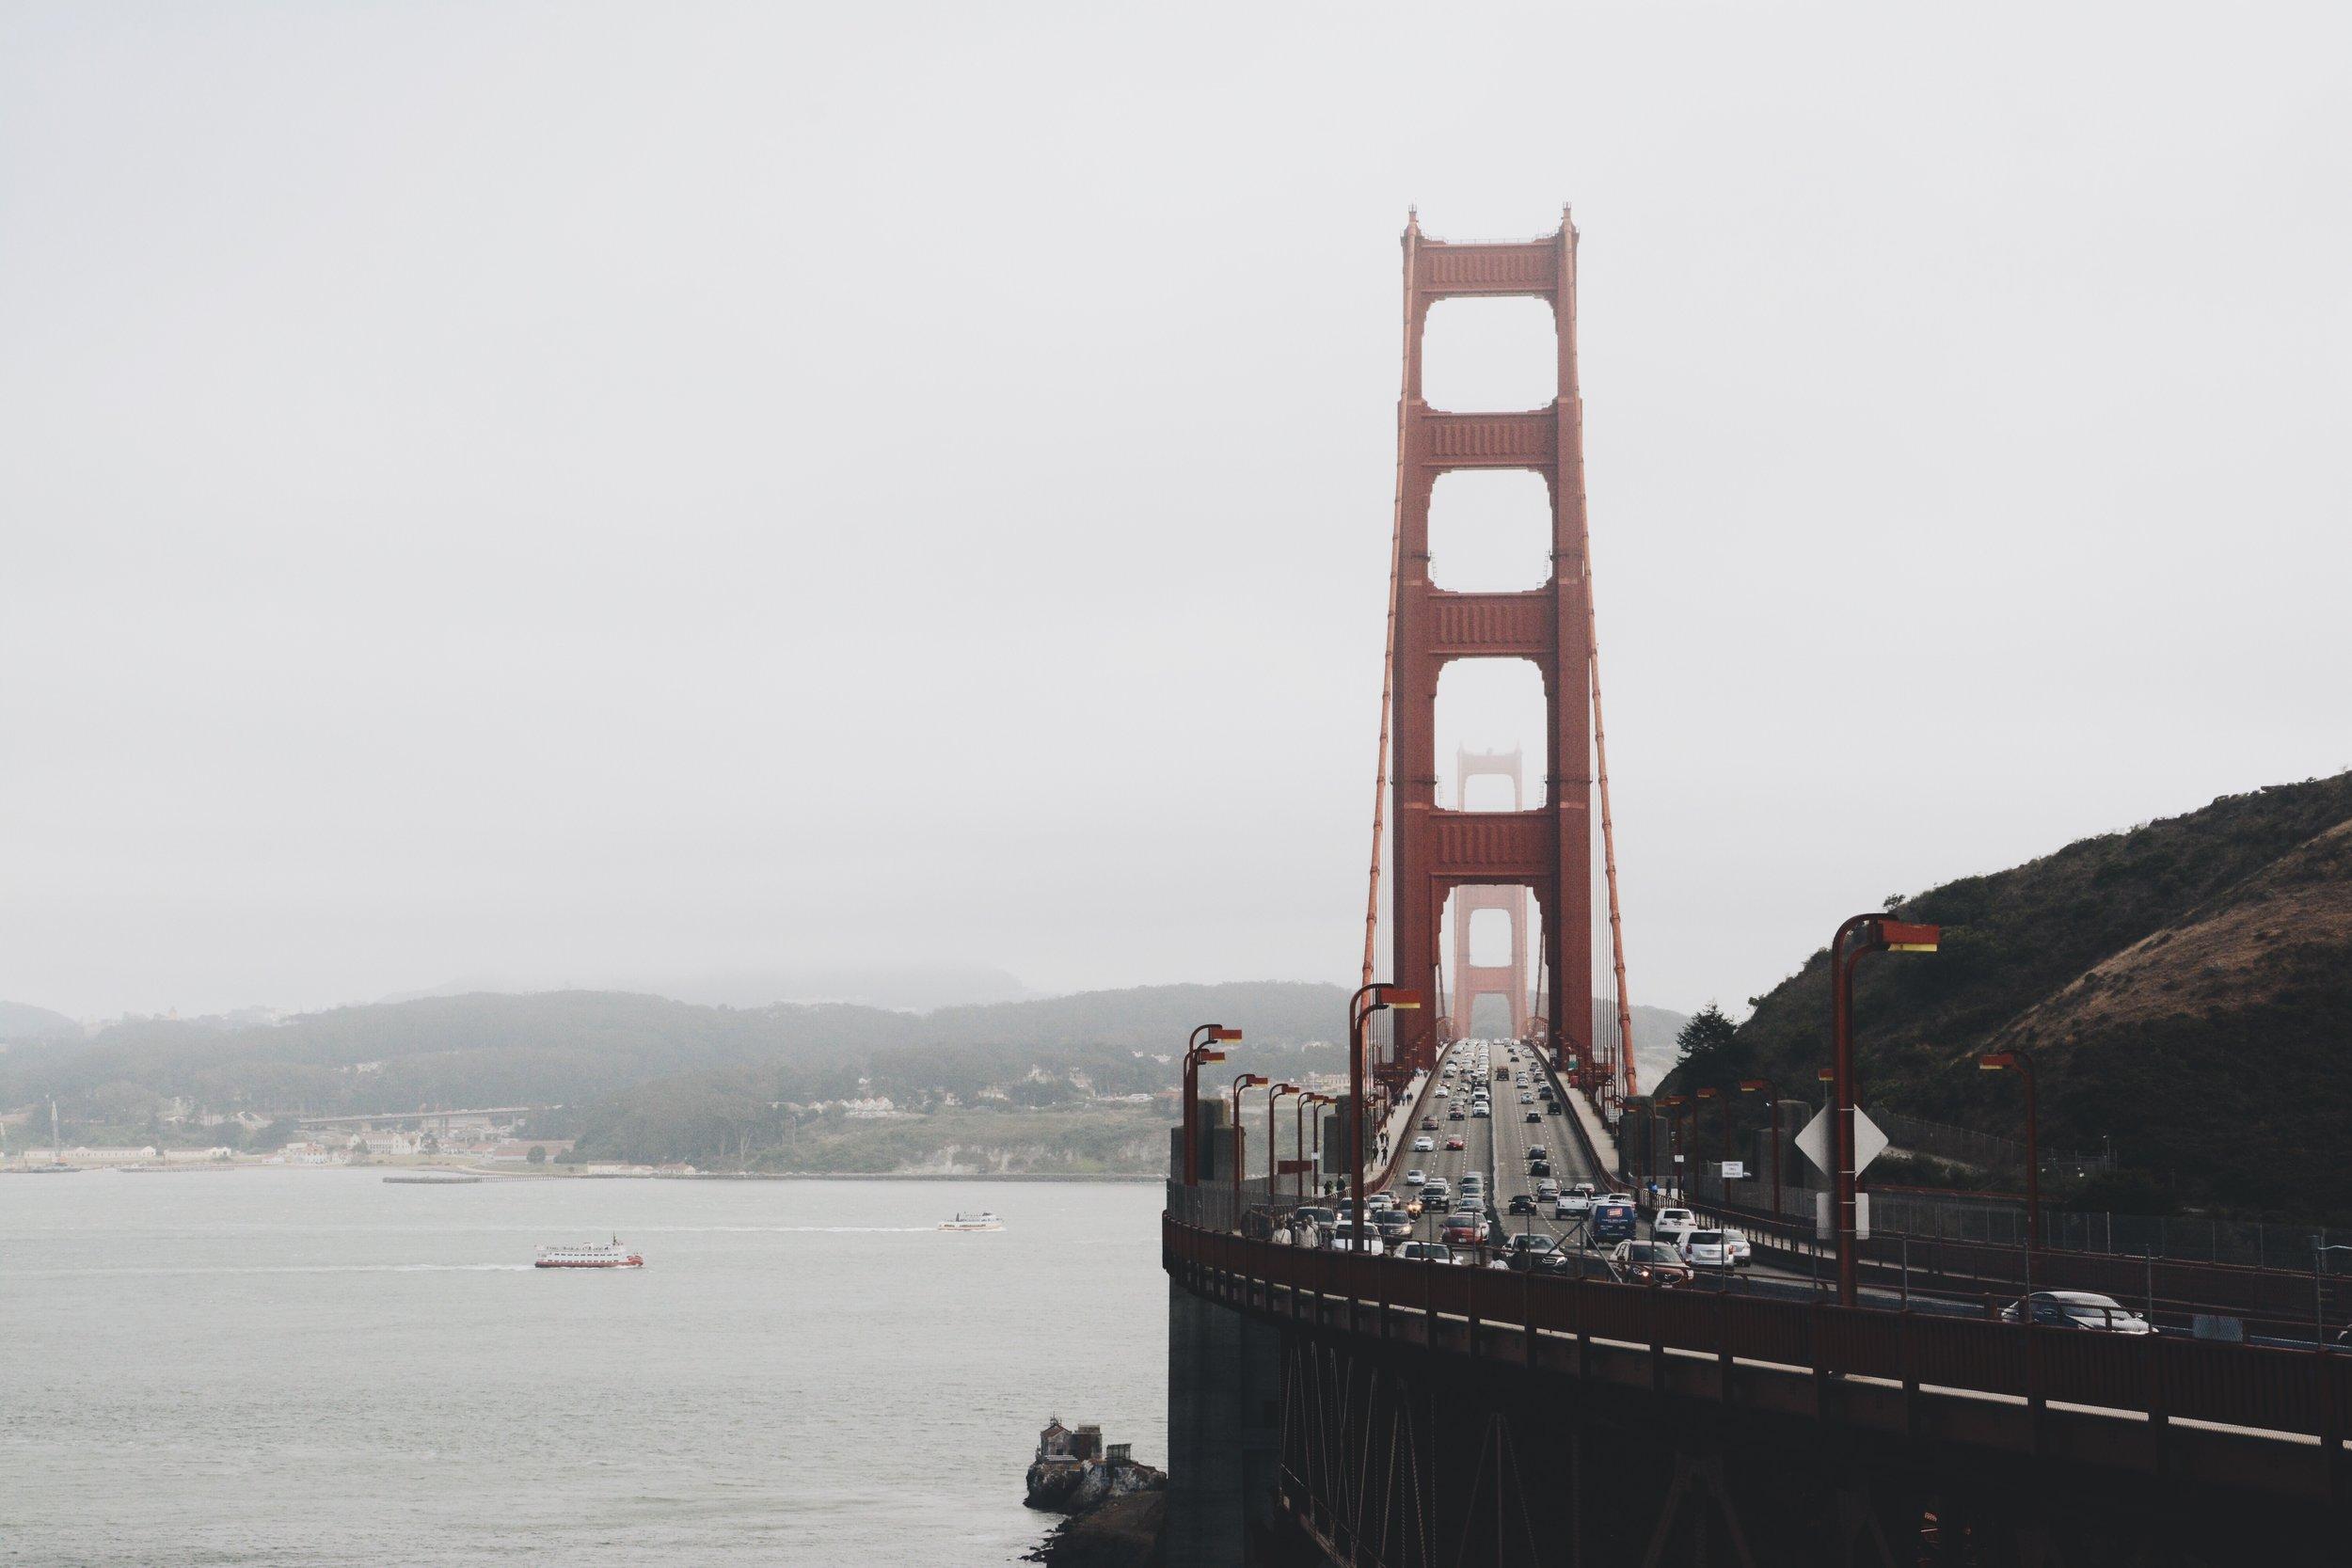 FINDING CALIFORNIA